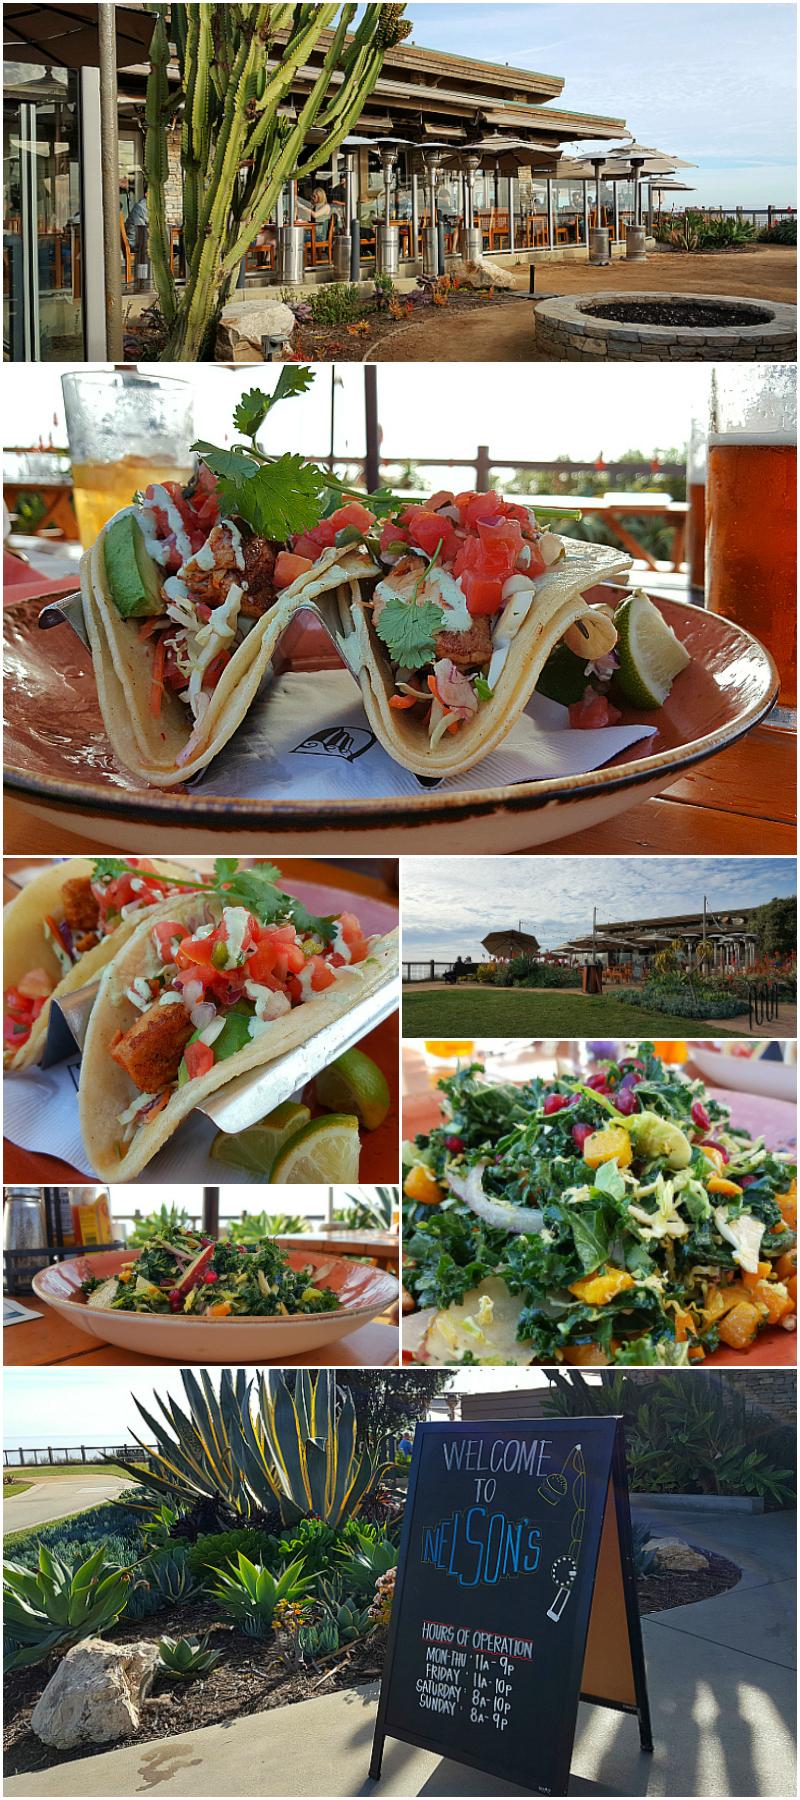 Nelson's at Terranea Resort n Palos Verdes